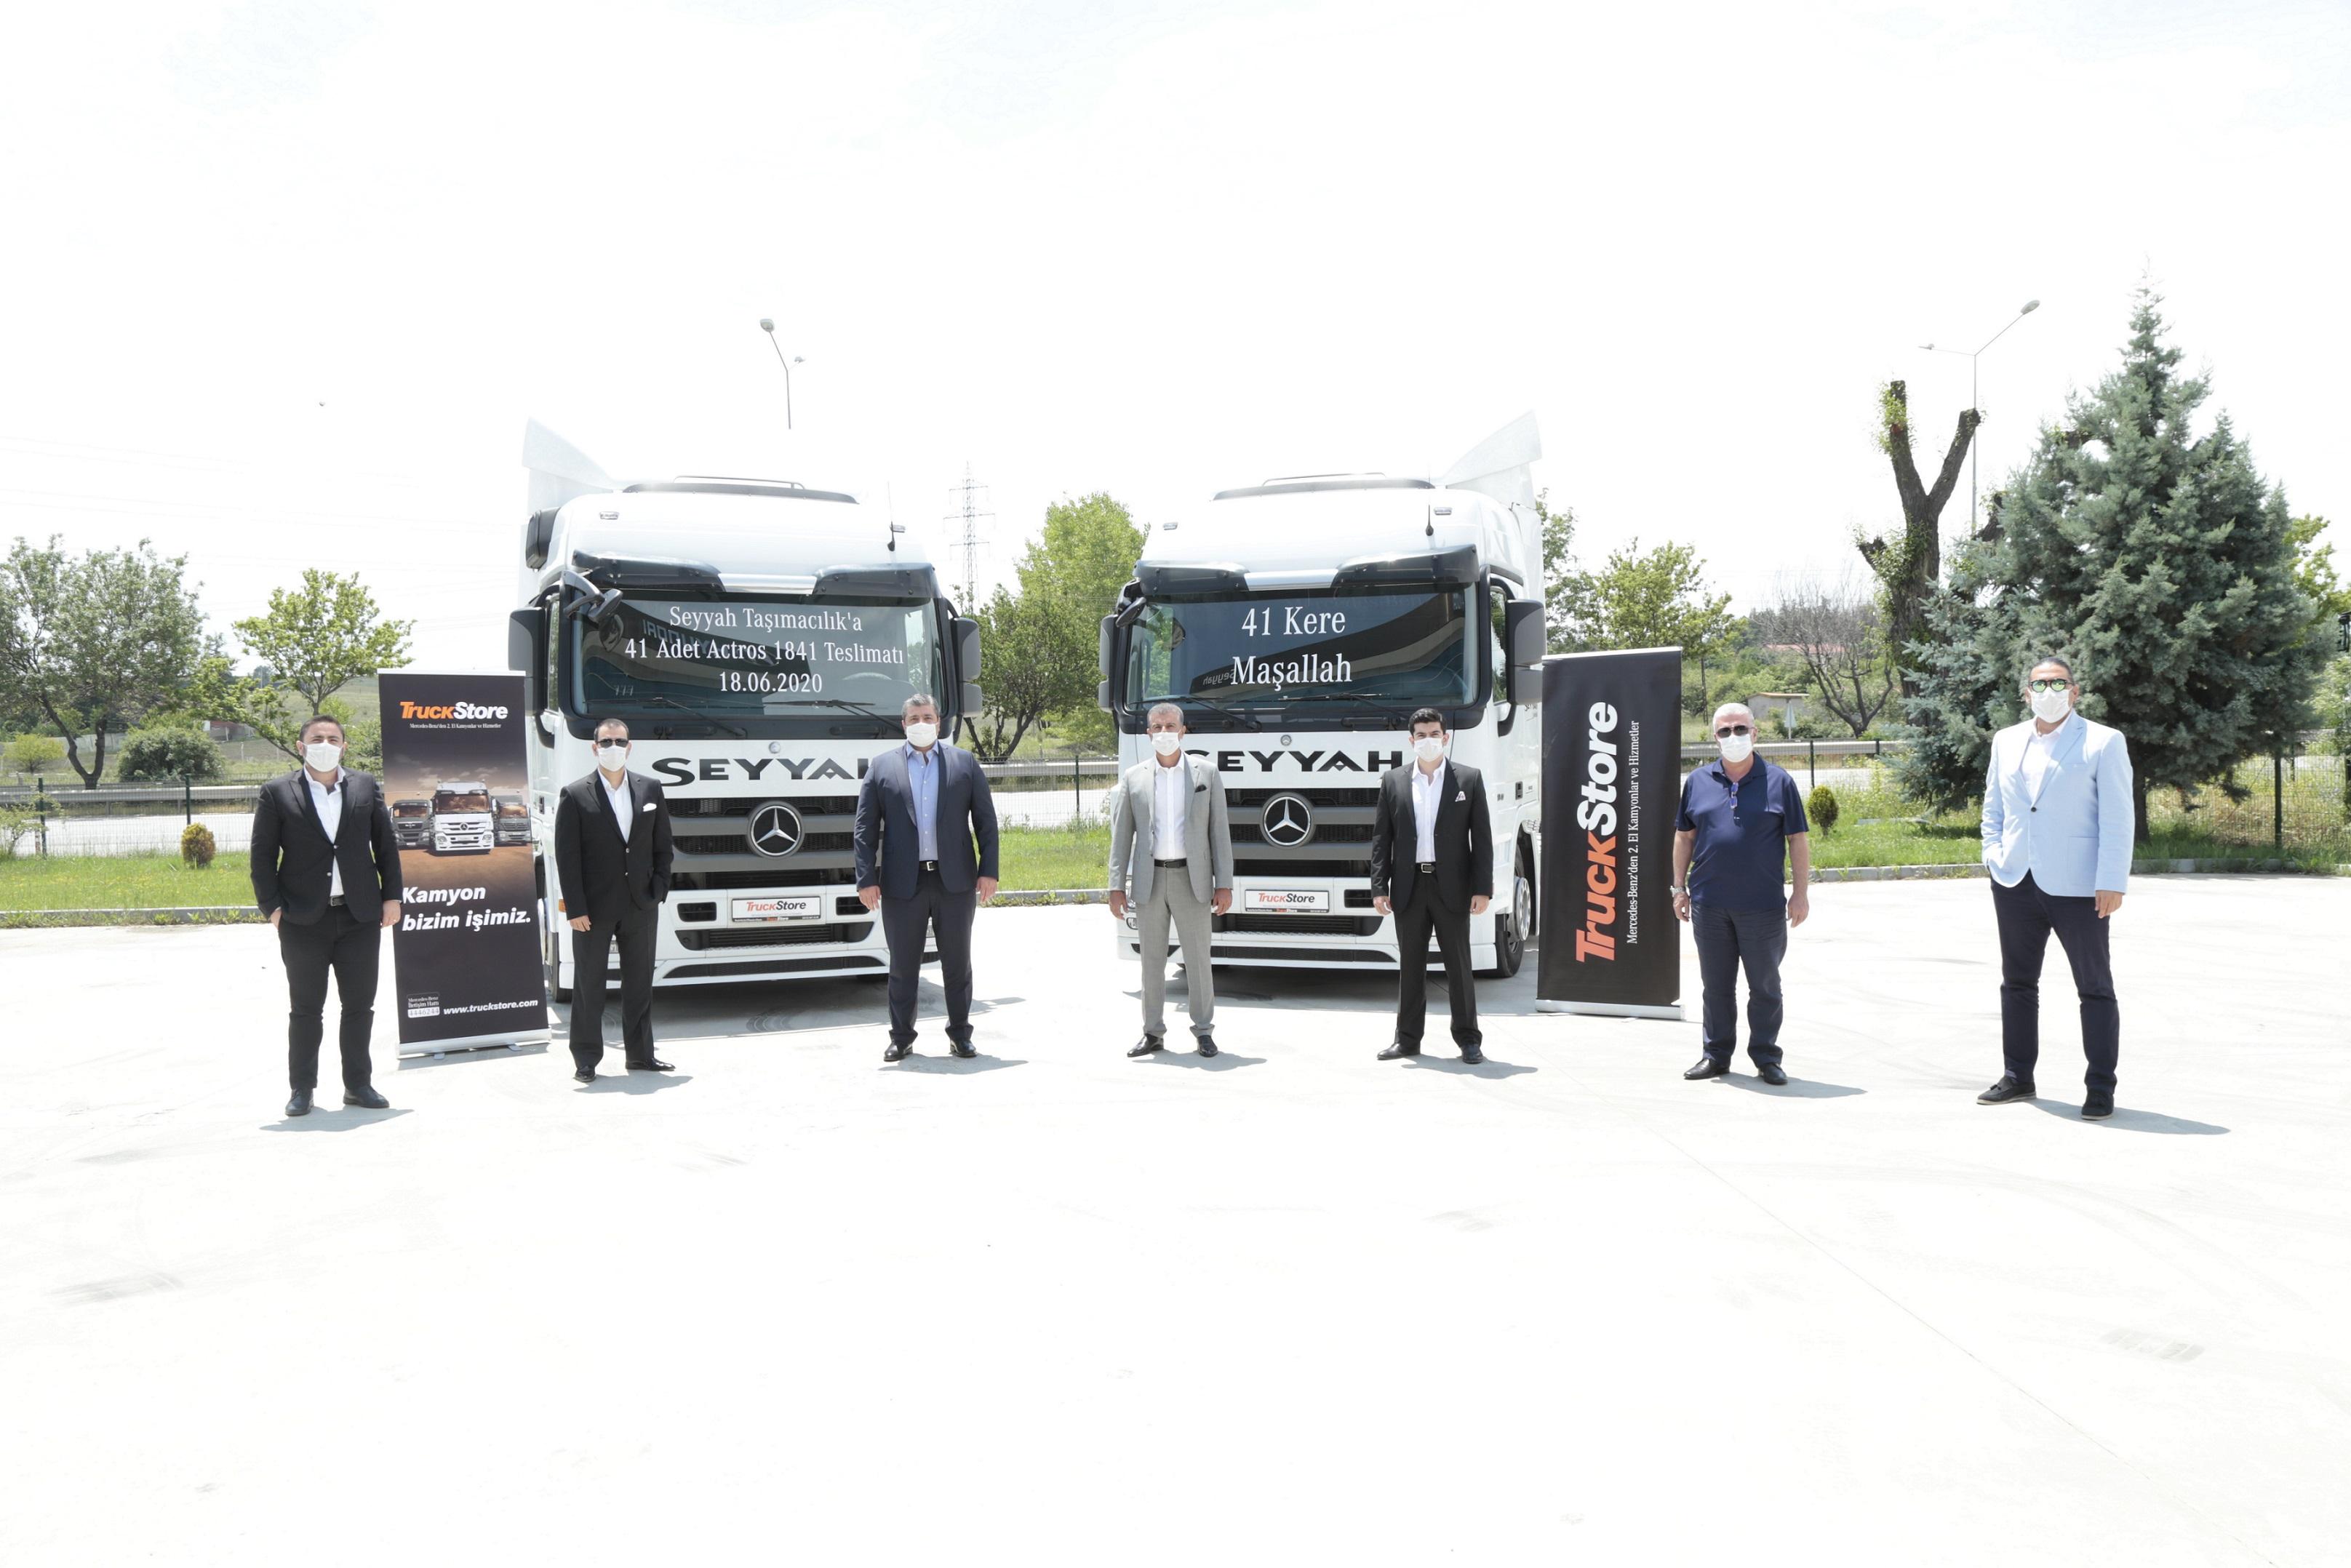 truckstore-seyyah-tasimacilik'a-41-adet-mercedes-benz-actros-teslim-etti.jpg